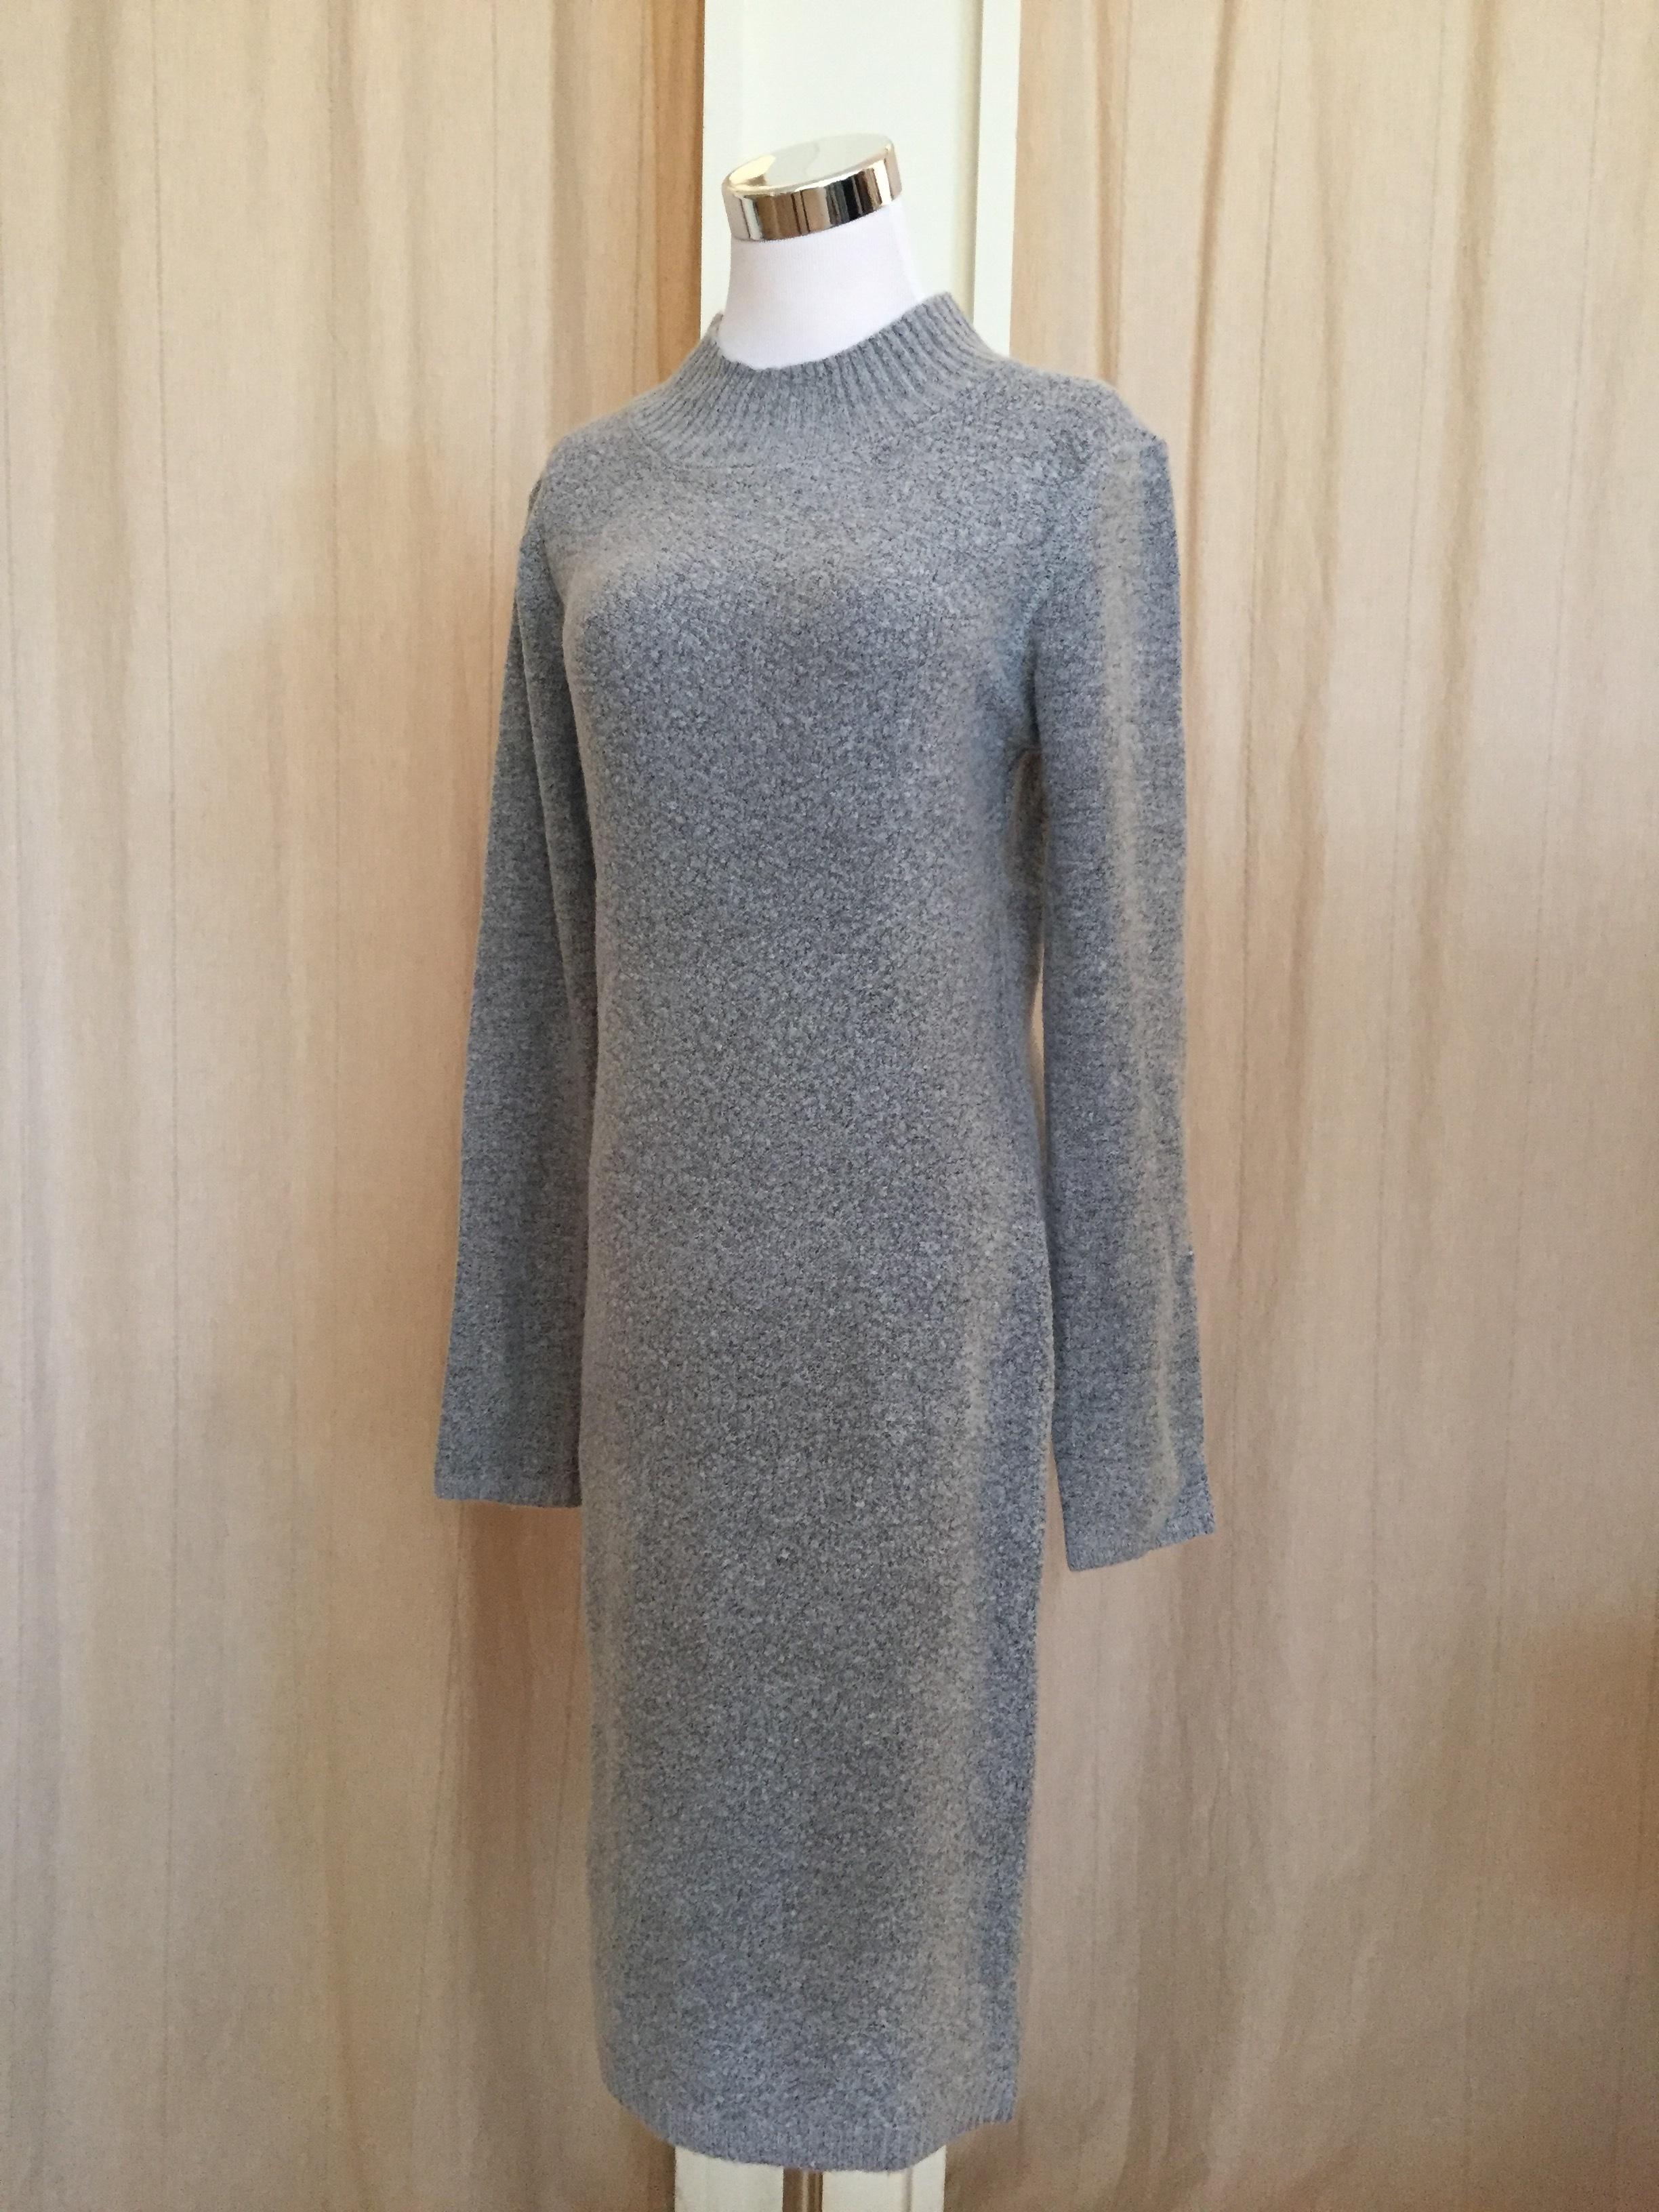 Mock Neck Sweater Dress ($42)